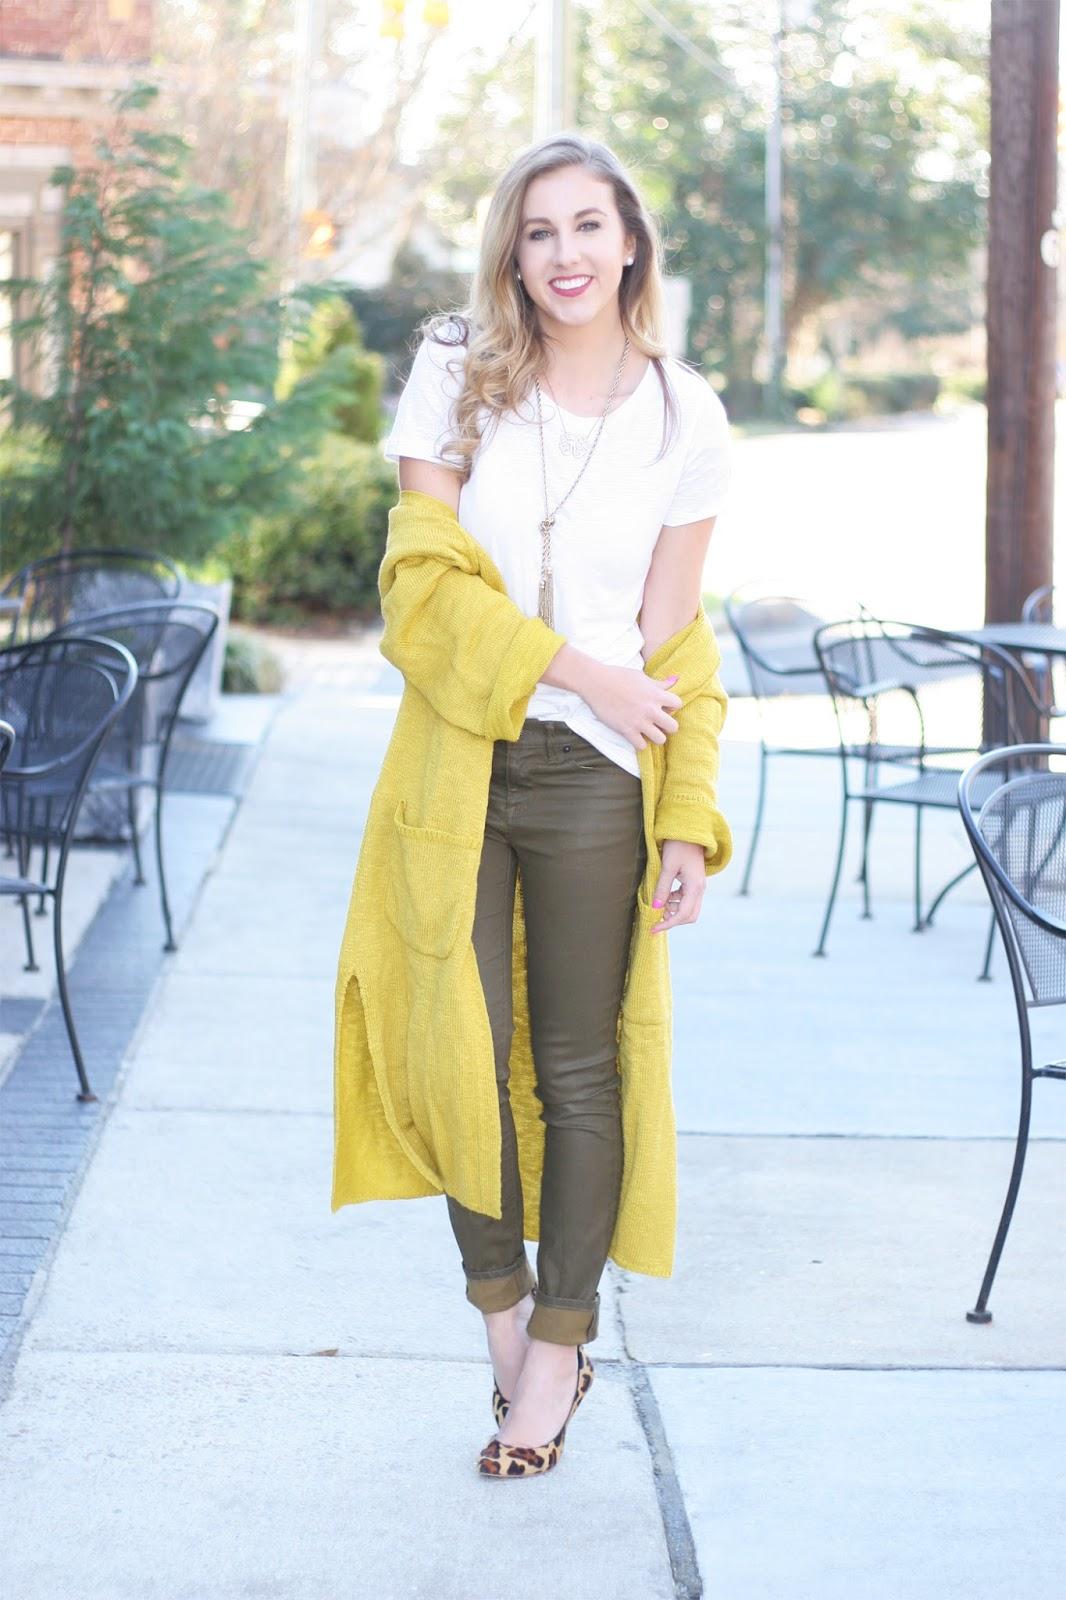 stylish-long-cardigan-outfit-street-style-